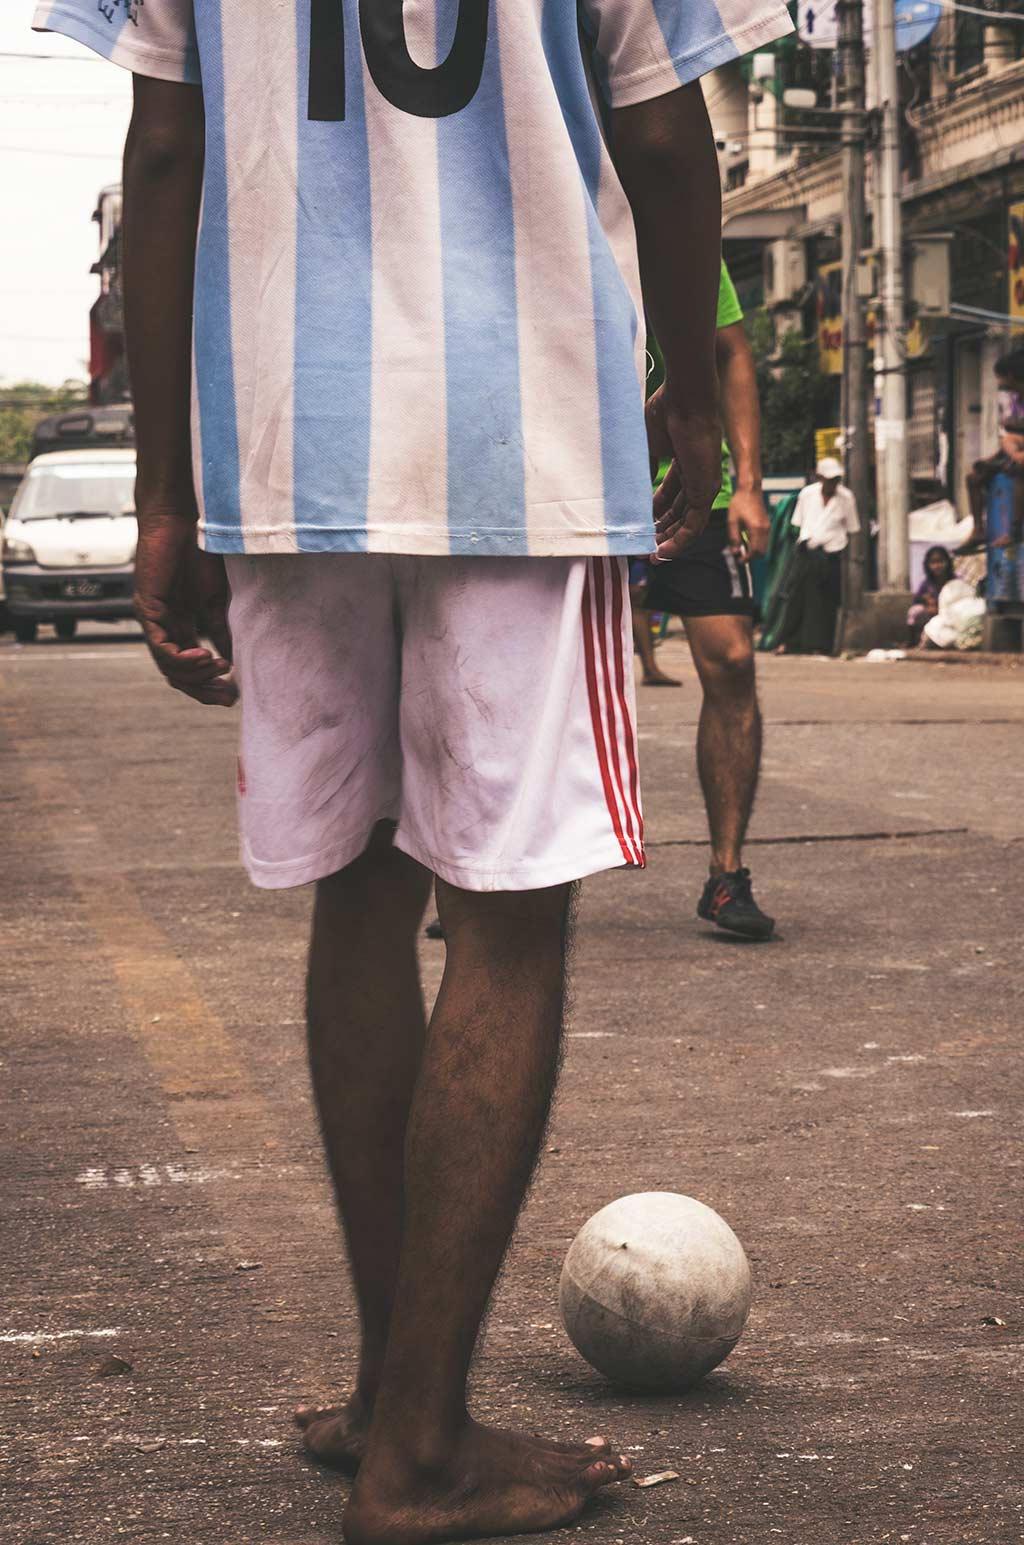 street soccer Myanmar